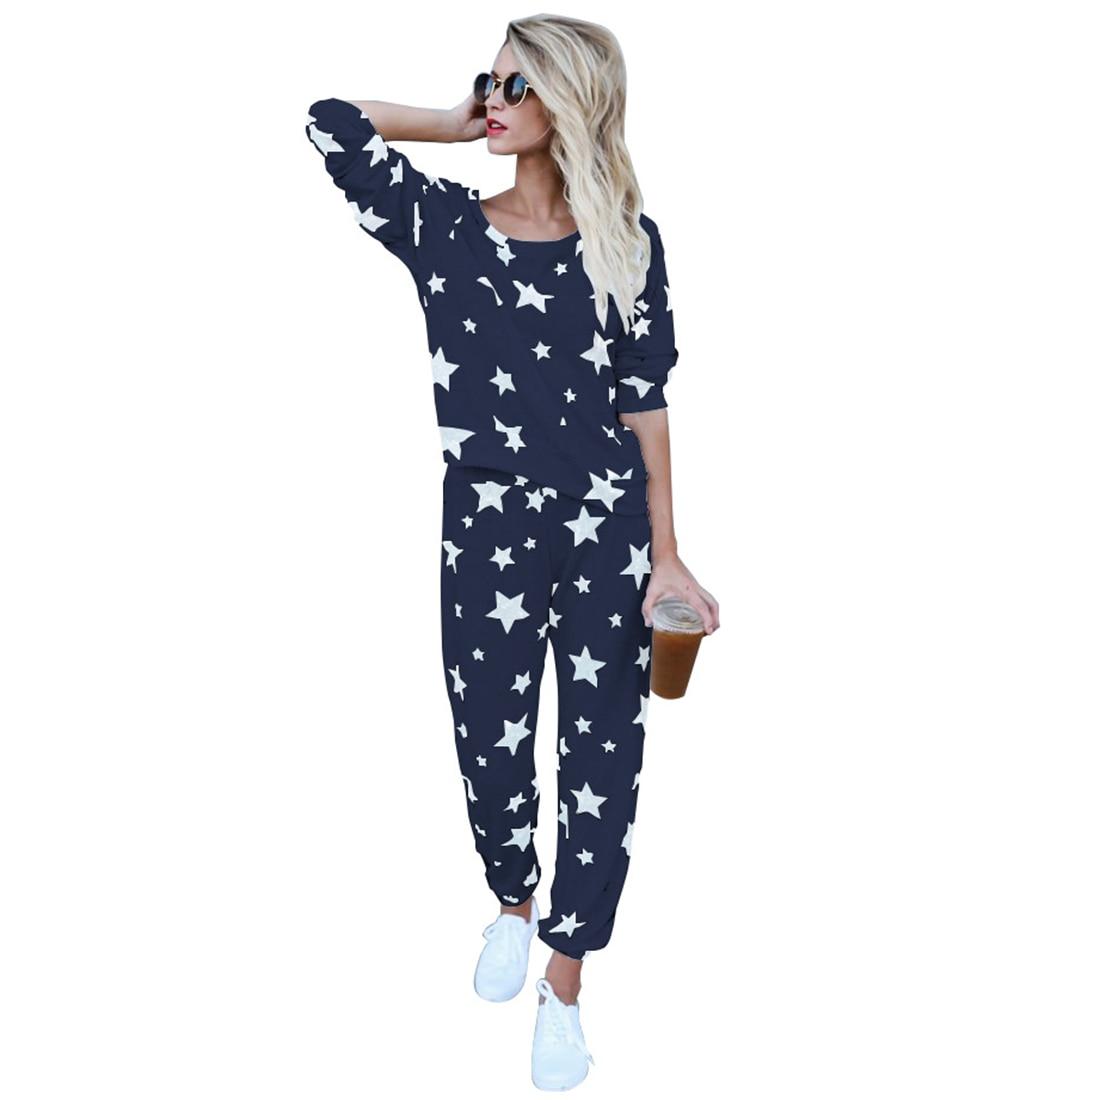 Women Long Sleeve Stars Printed Two Piece Set Ladies 2017 Autumn Tops And Pants Tracksuit Hoodies Sweatshirts Elastic Waist Suit